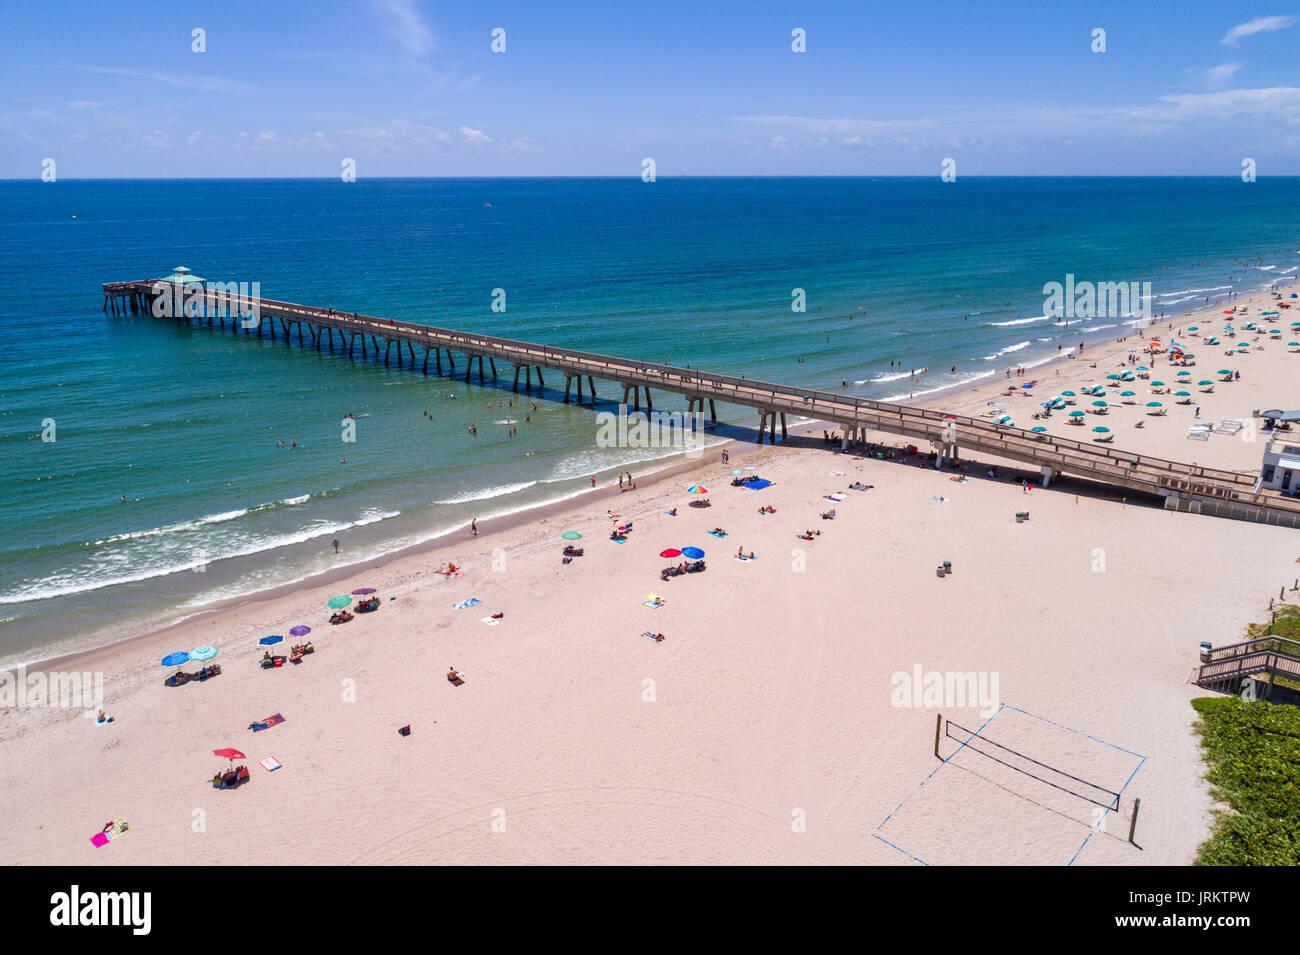 Aerial beach sunbathers stock photos aerial beach for Vero beach fishing pier